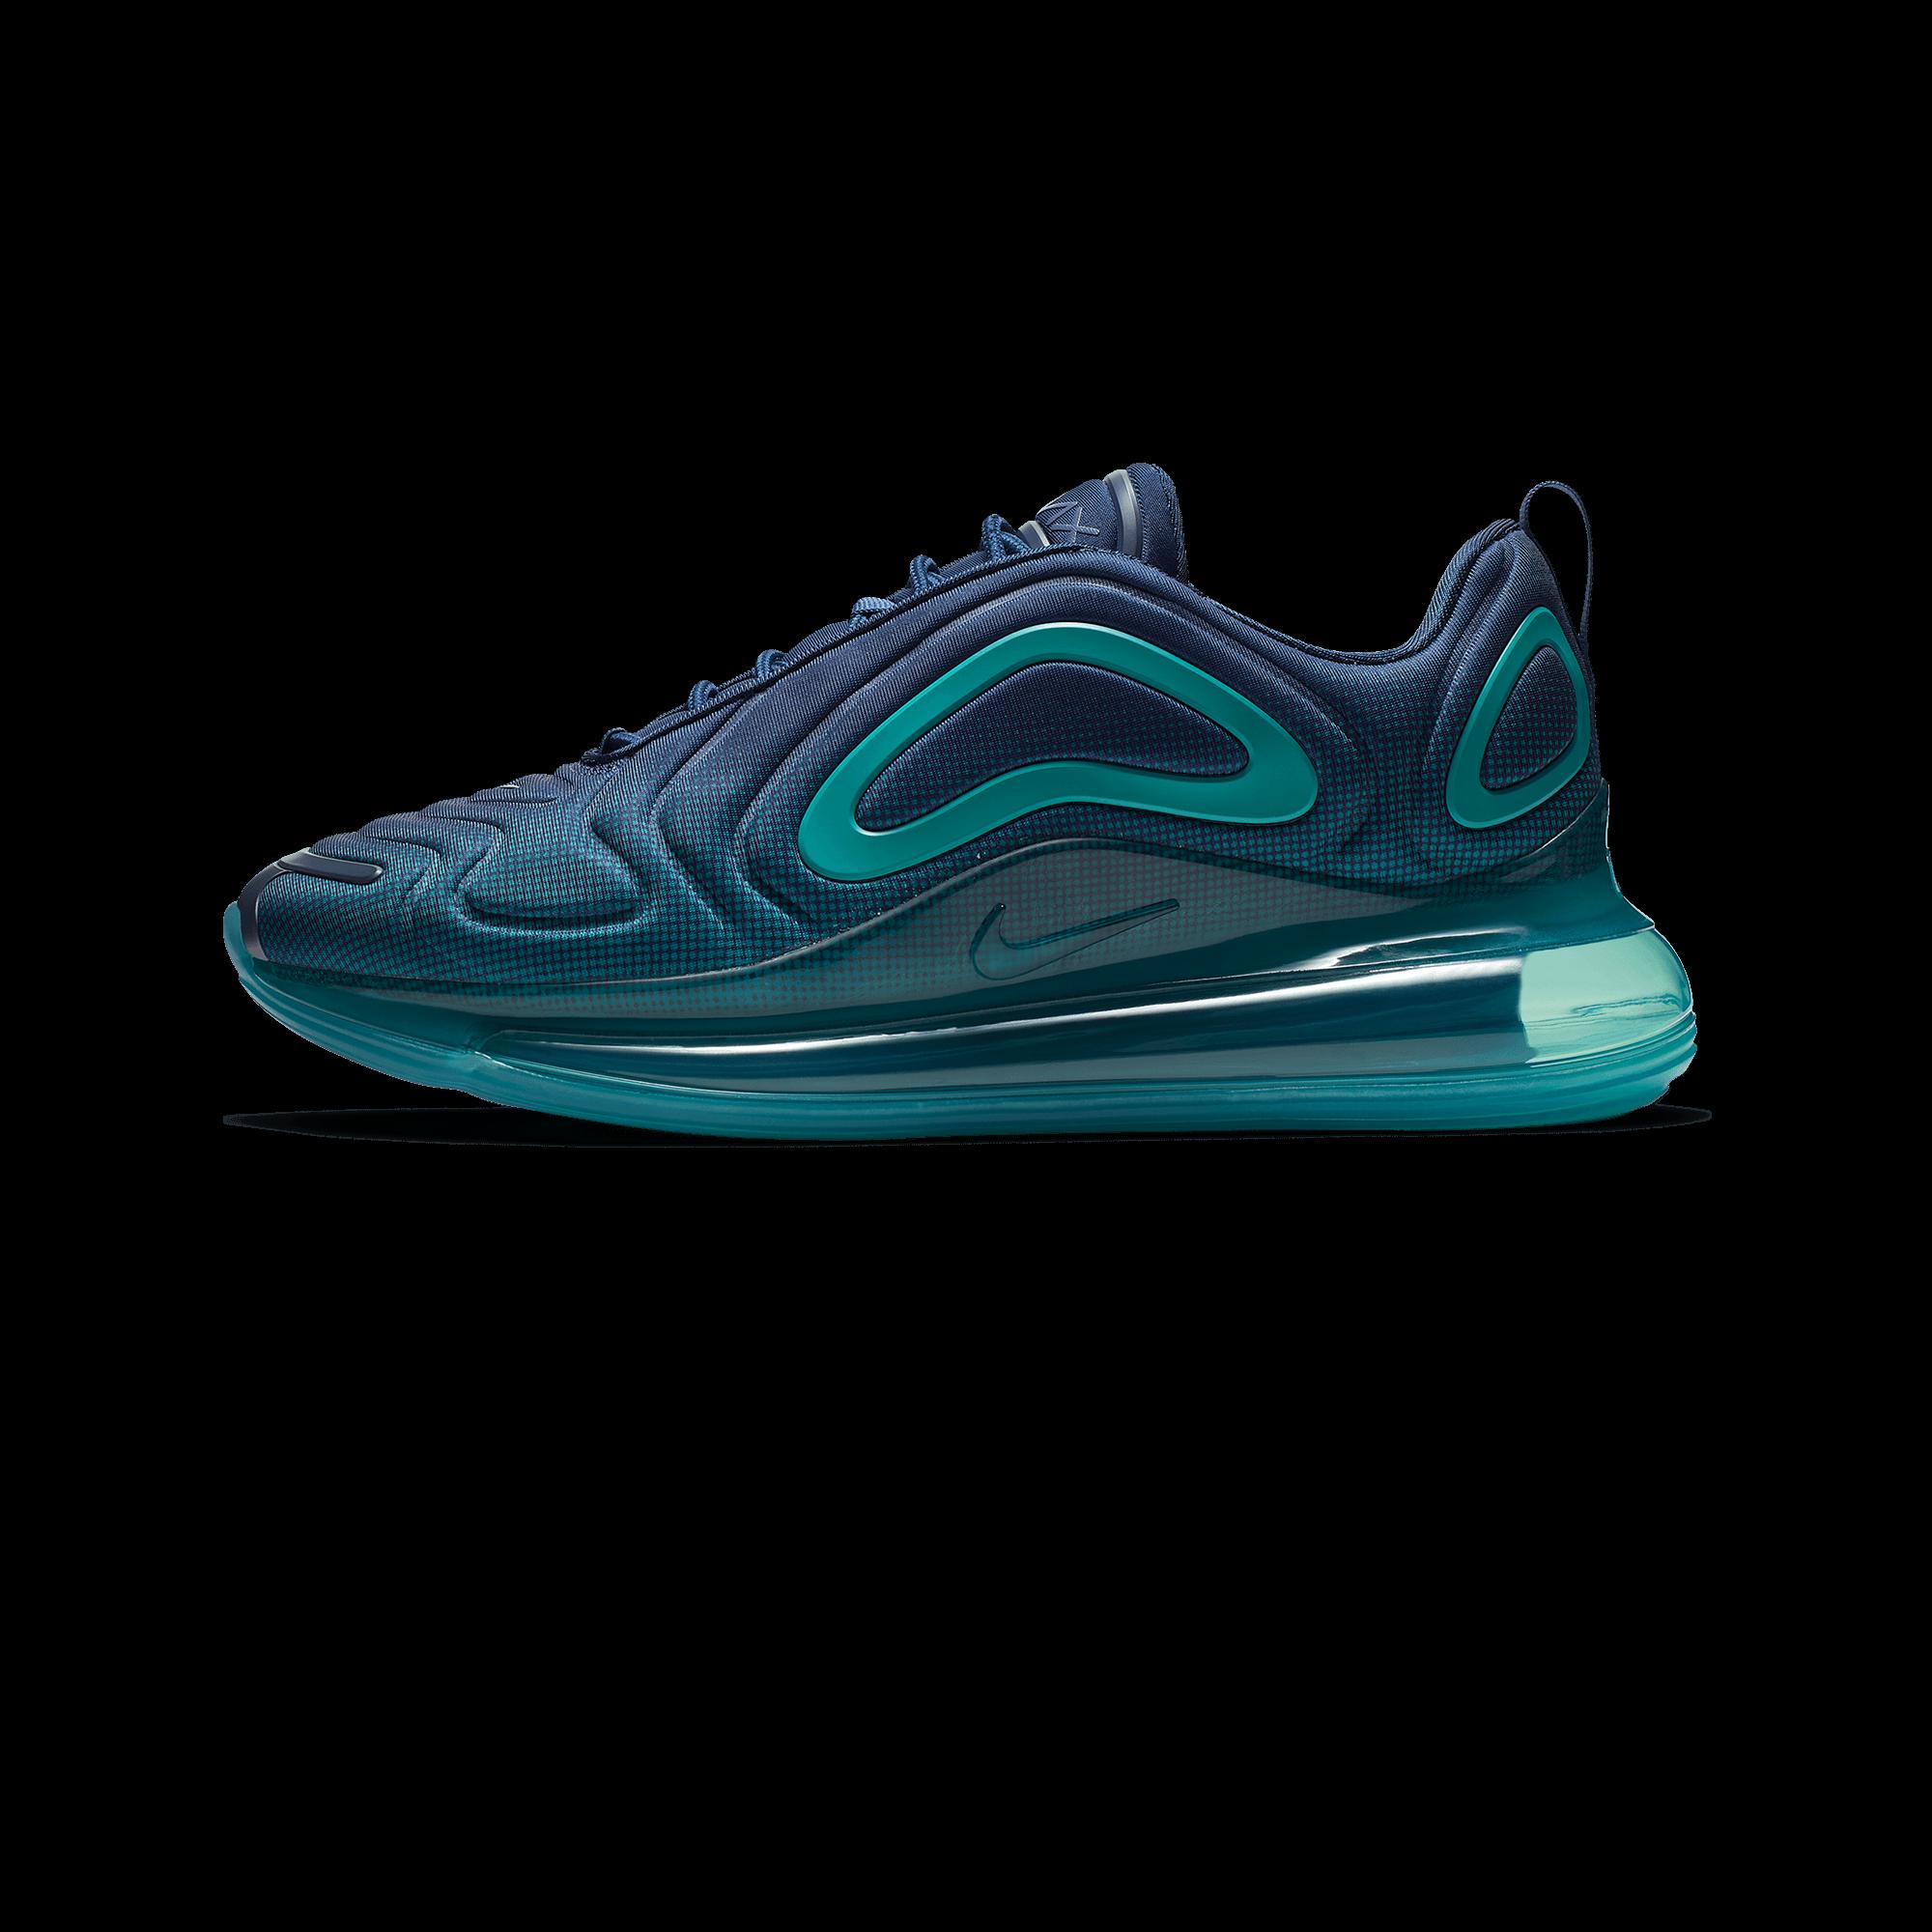 Nike Air Max 720 blue void court purple spirit teal Men |